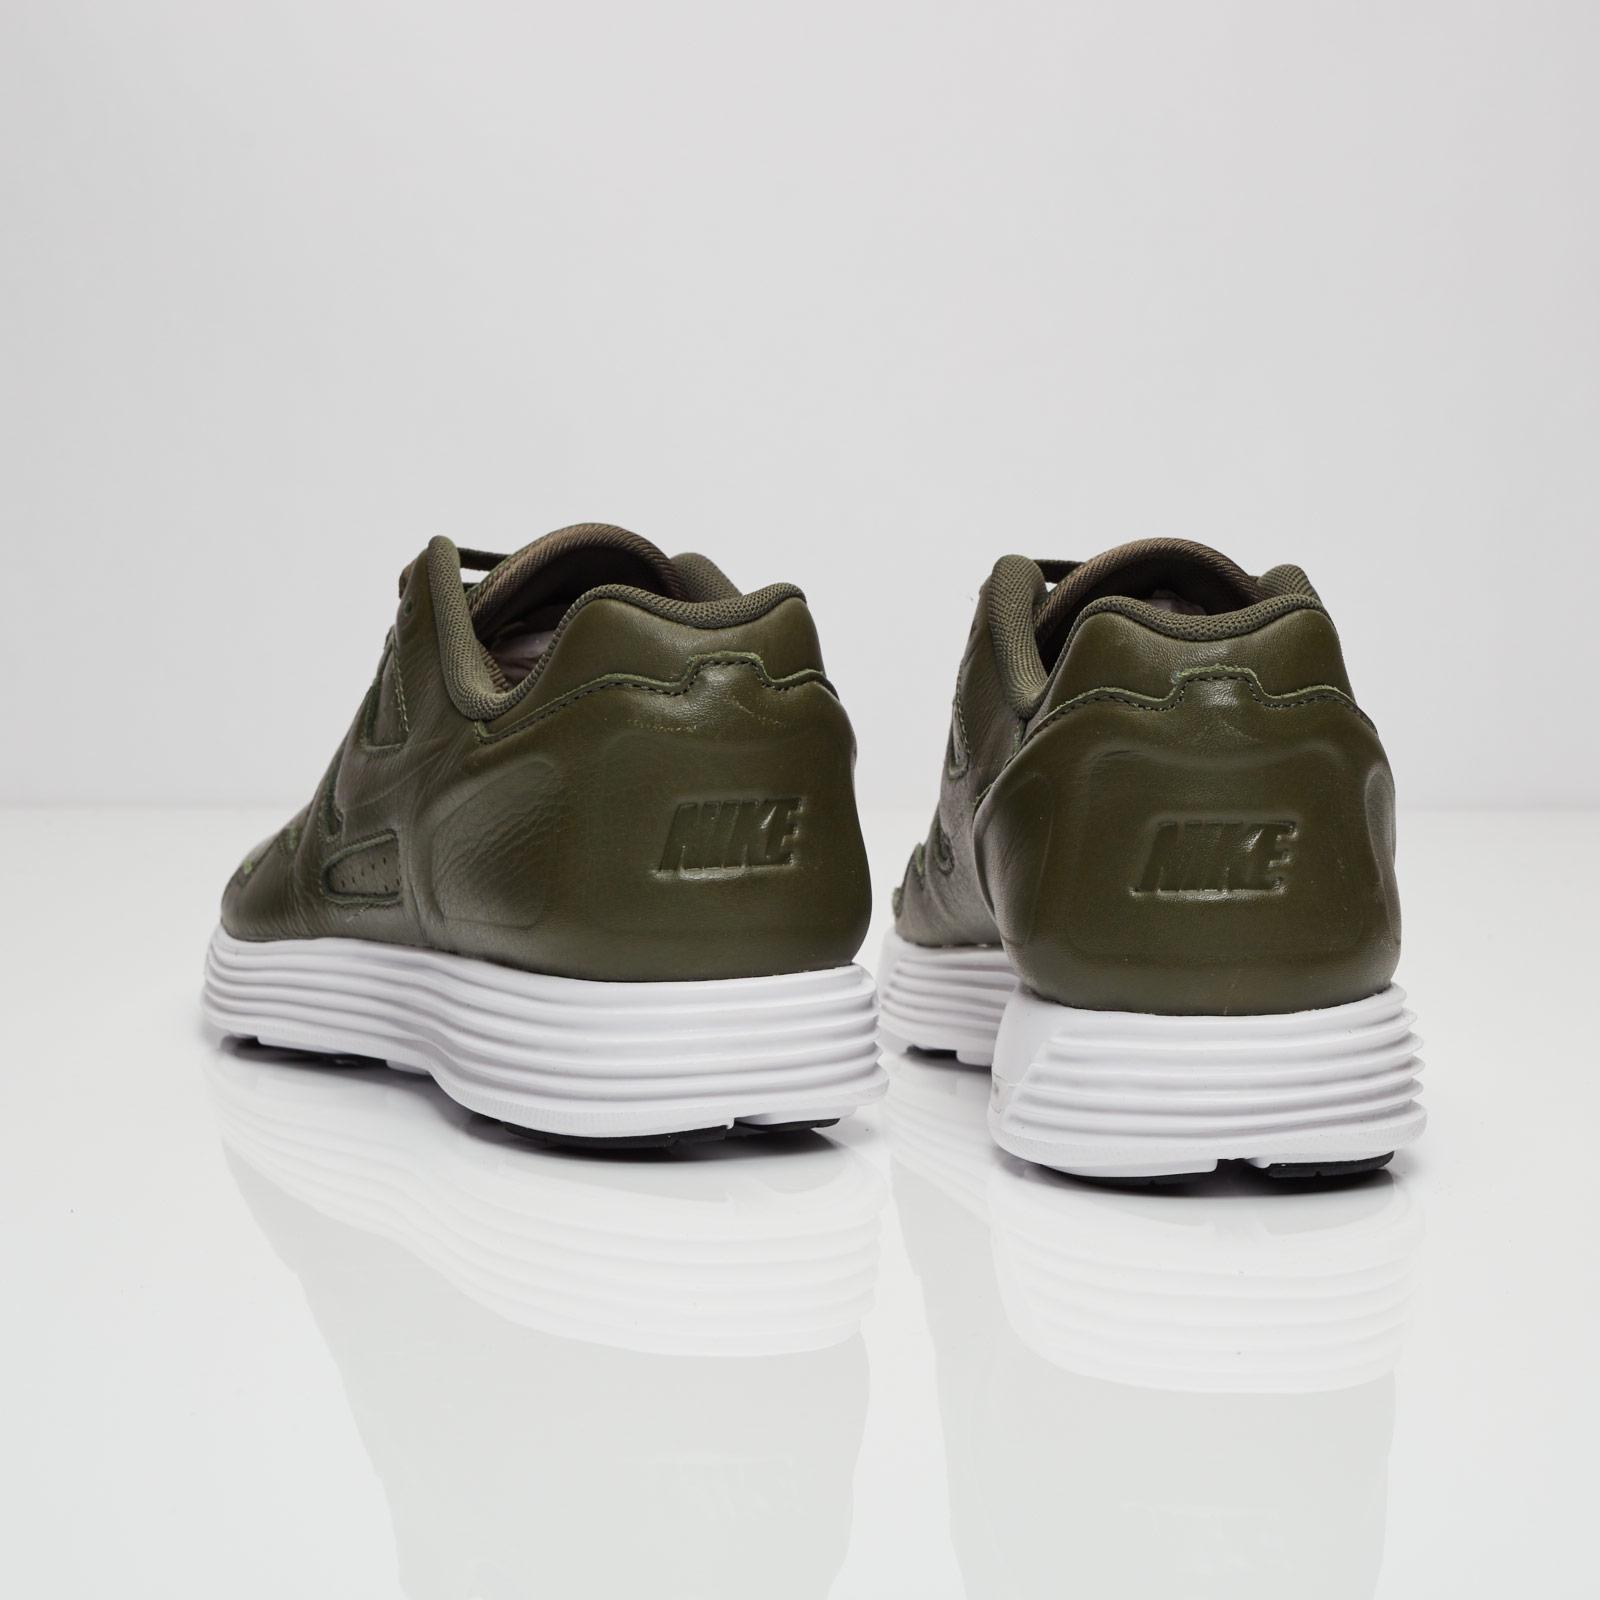 425d7042639c Nike Lunar Flow Laser Premium - 833127-300 - Sneakersnstuff ...